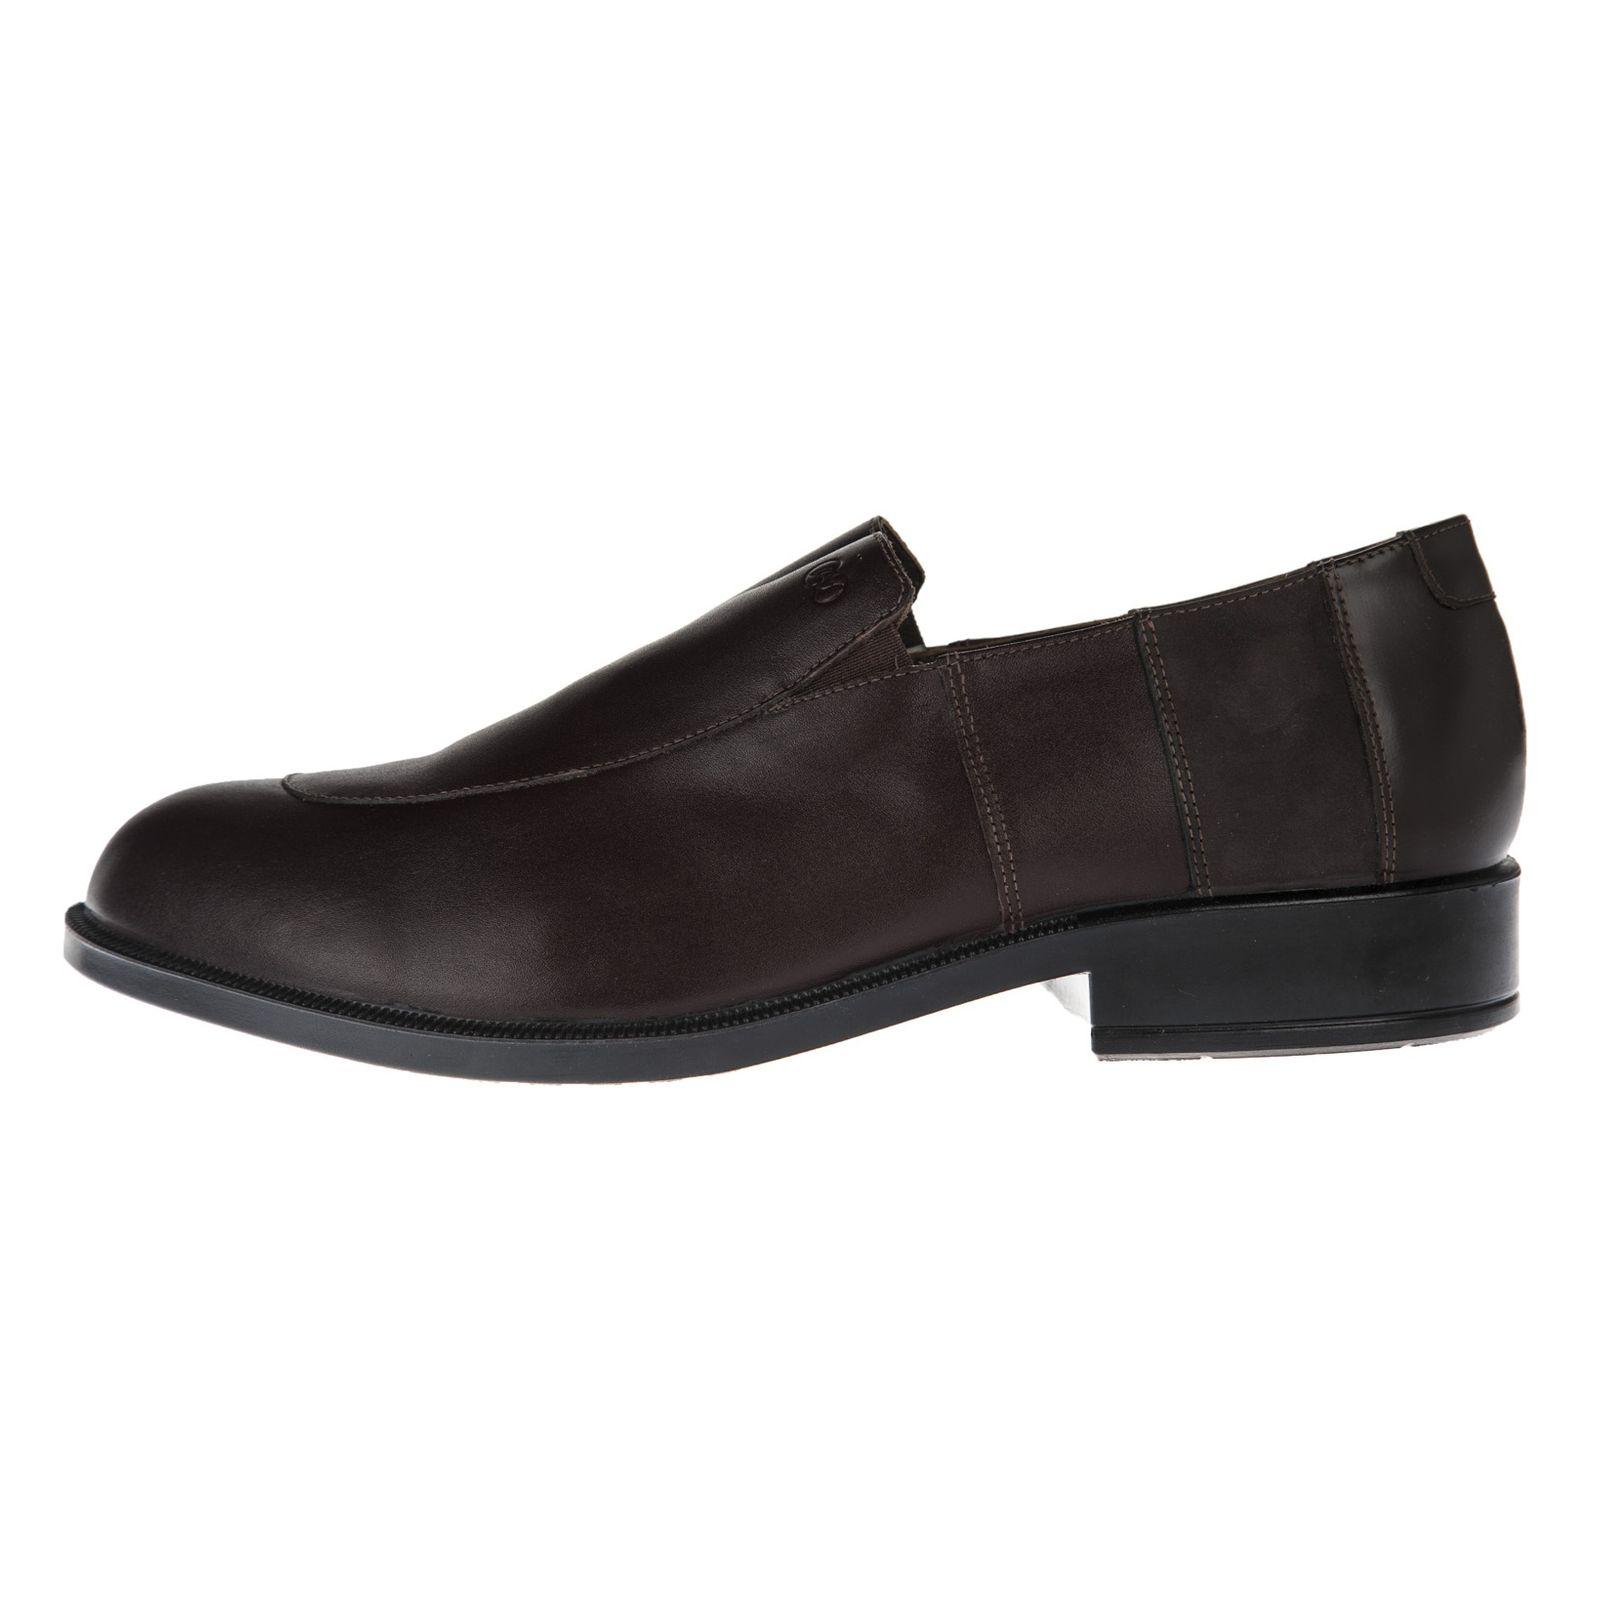 کفش مردانه دنیلی مدل 209110136019 -  - 1